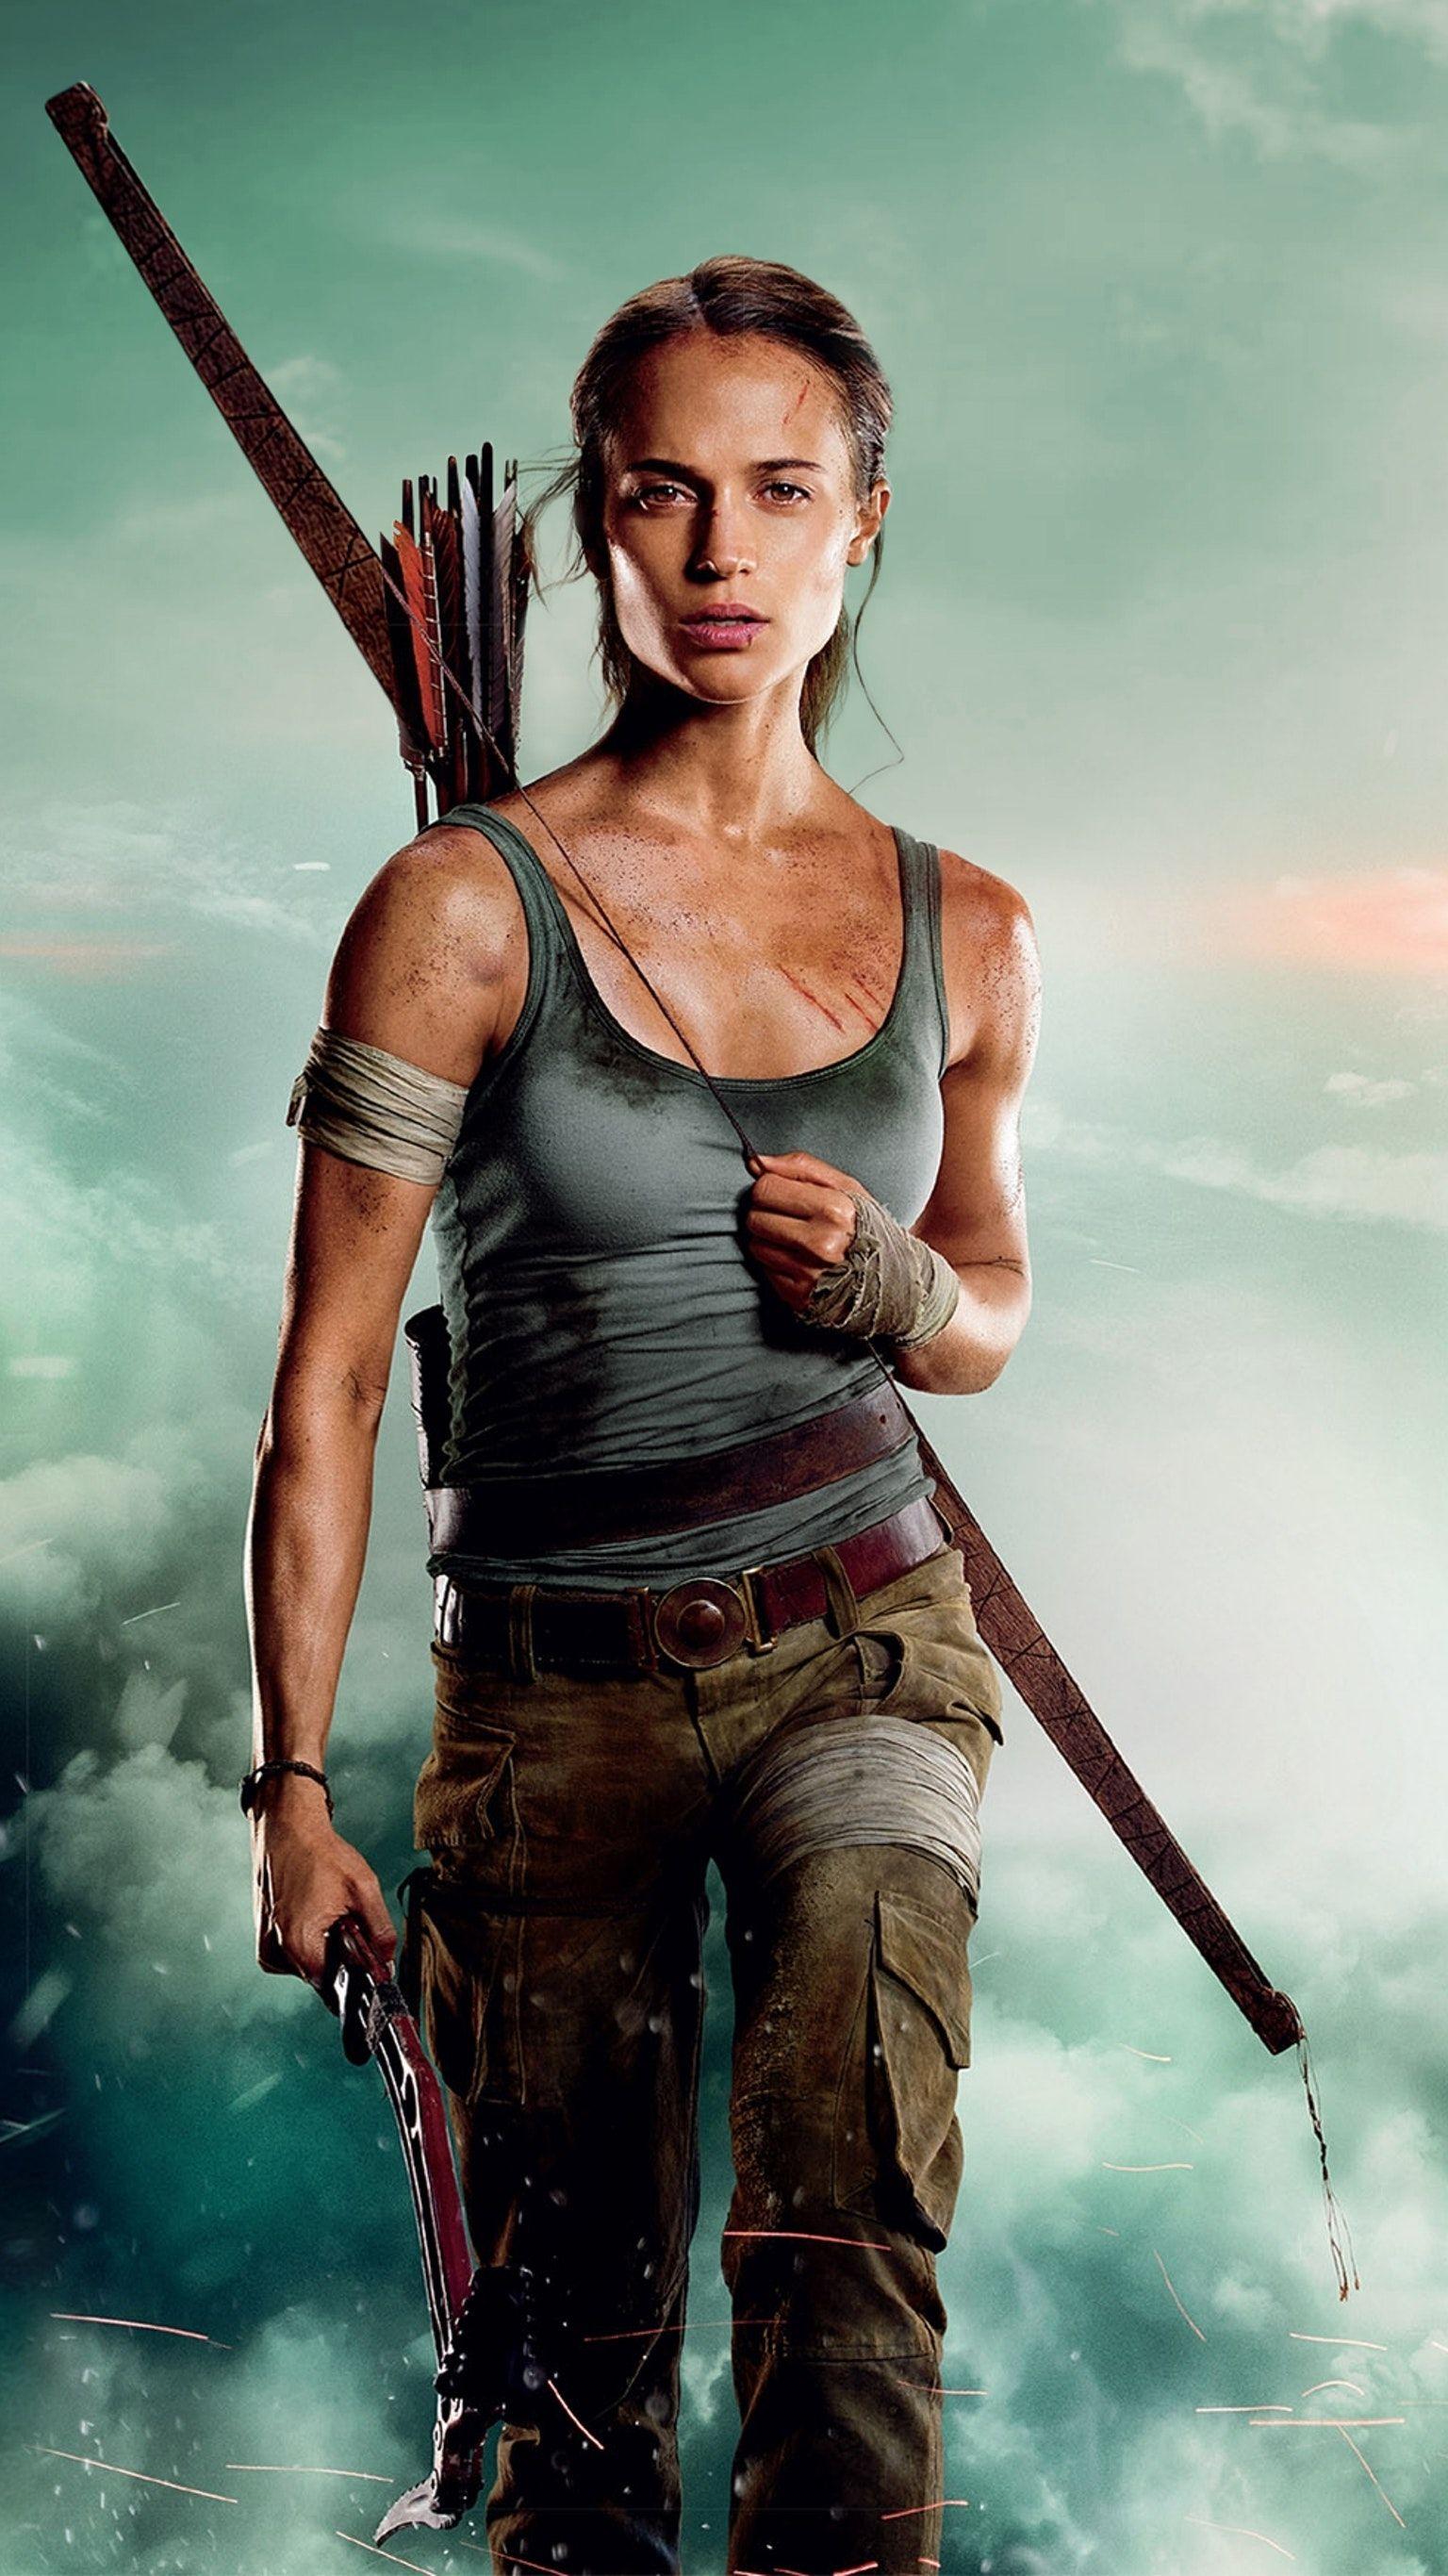 Free Download Tomb Raider 2018 Phone Wallpaper In 2019 01inbox